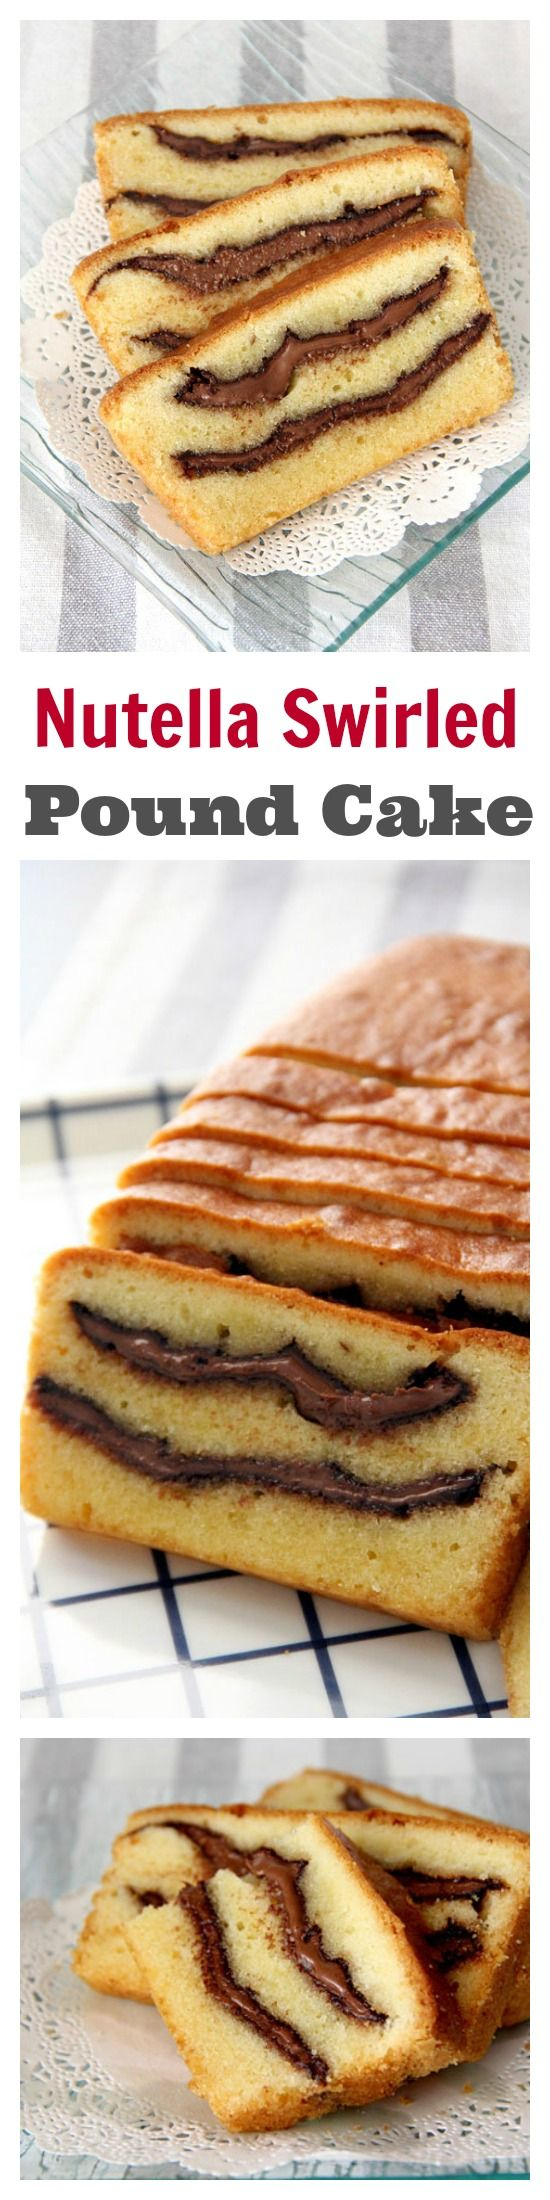 Nutella swirled pound cake - thick, gooey Nutella swirls in rich buttery pound cake | rasamalaysia.com